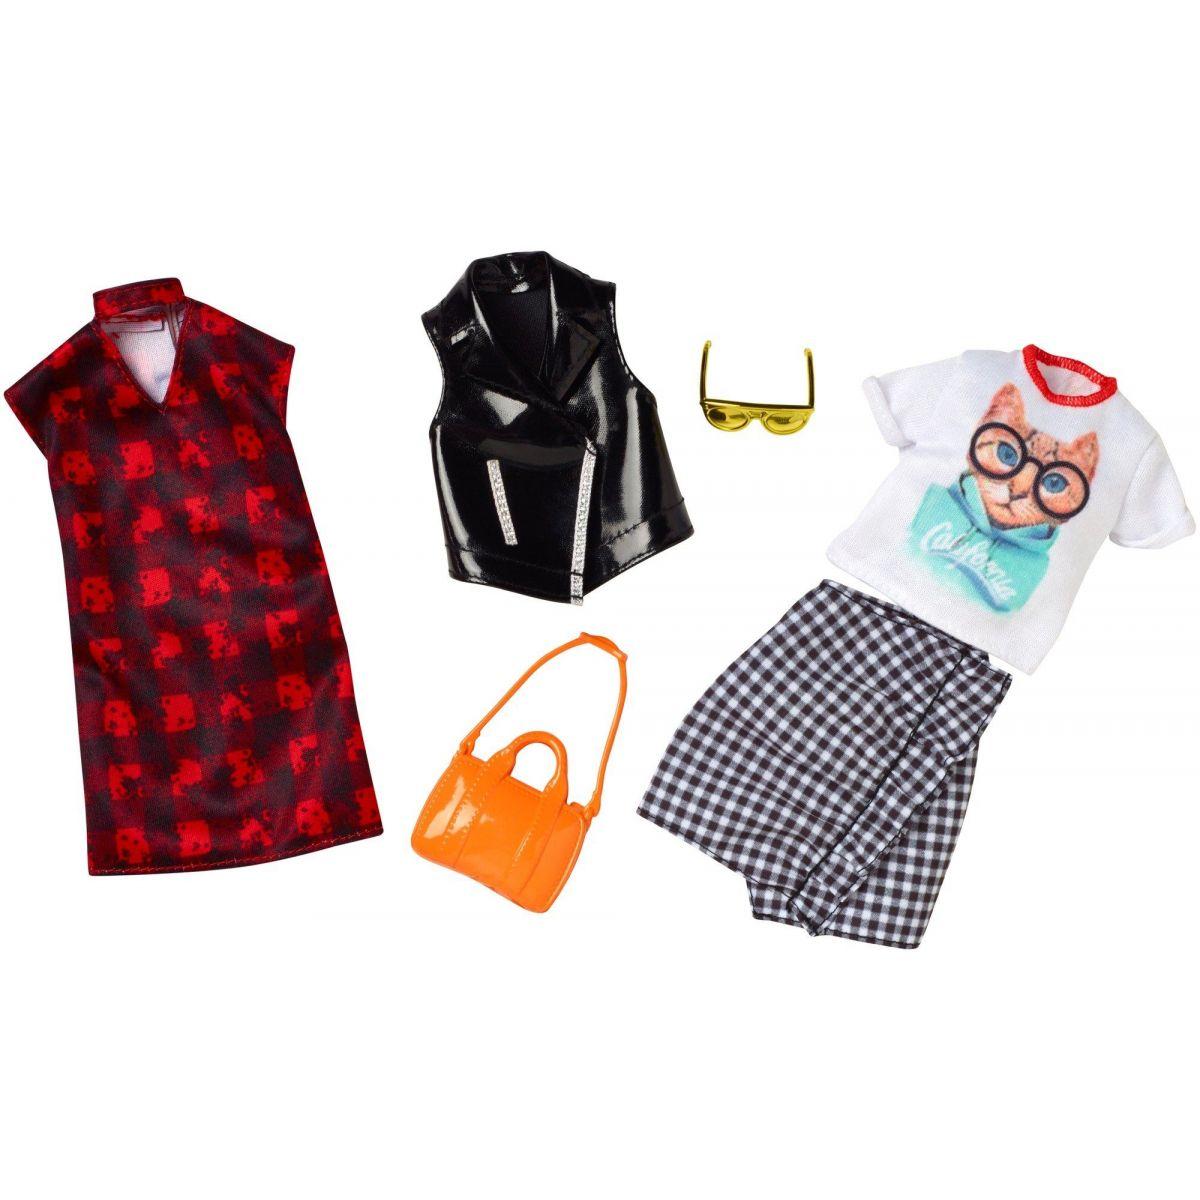 Mattel Barbie Dvojdielny set oblečenie FKT41